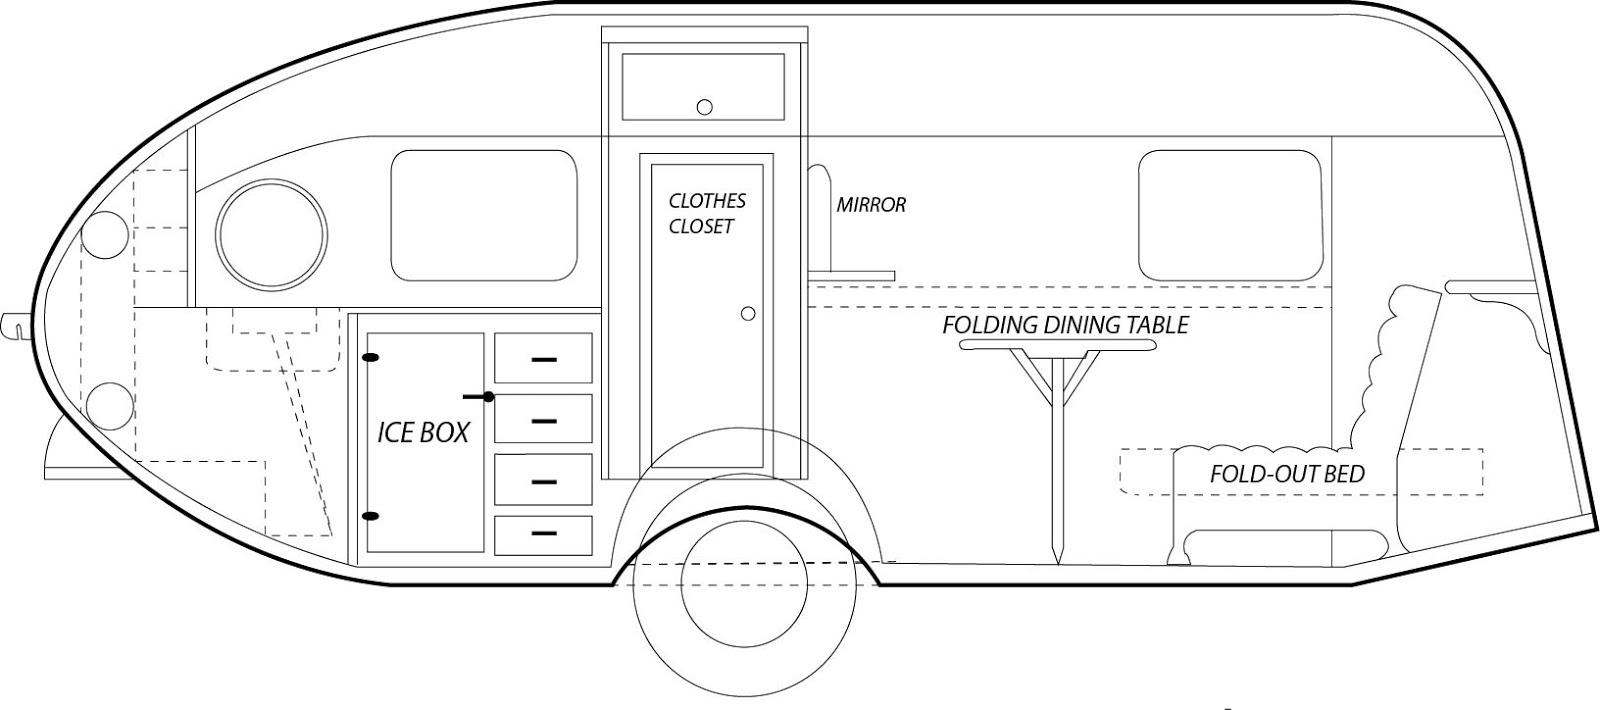 Airstream Interior Diagram Manual Guide Wiring Trailer Clipper Section Rh Theairstreamclipper Blogspot Com 2014 Safari